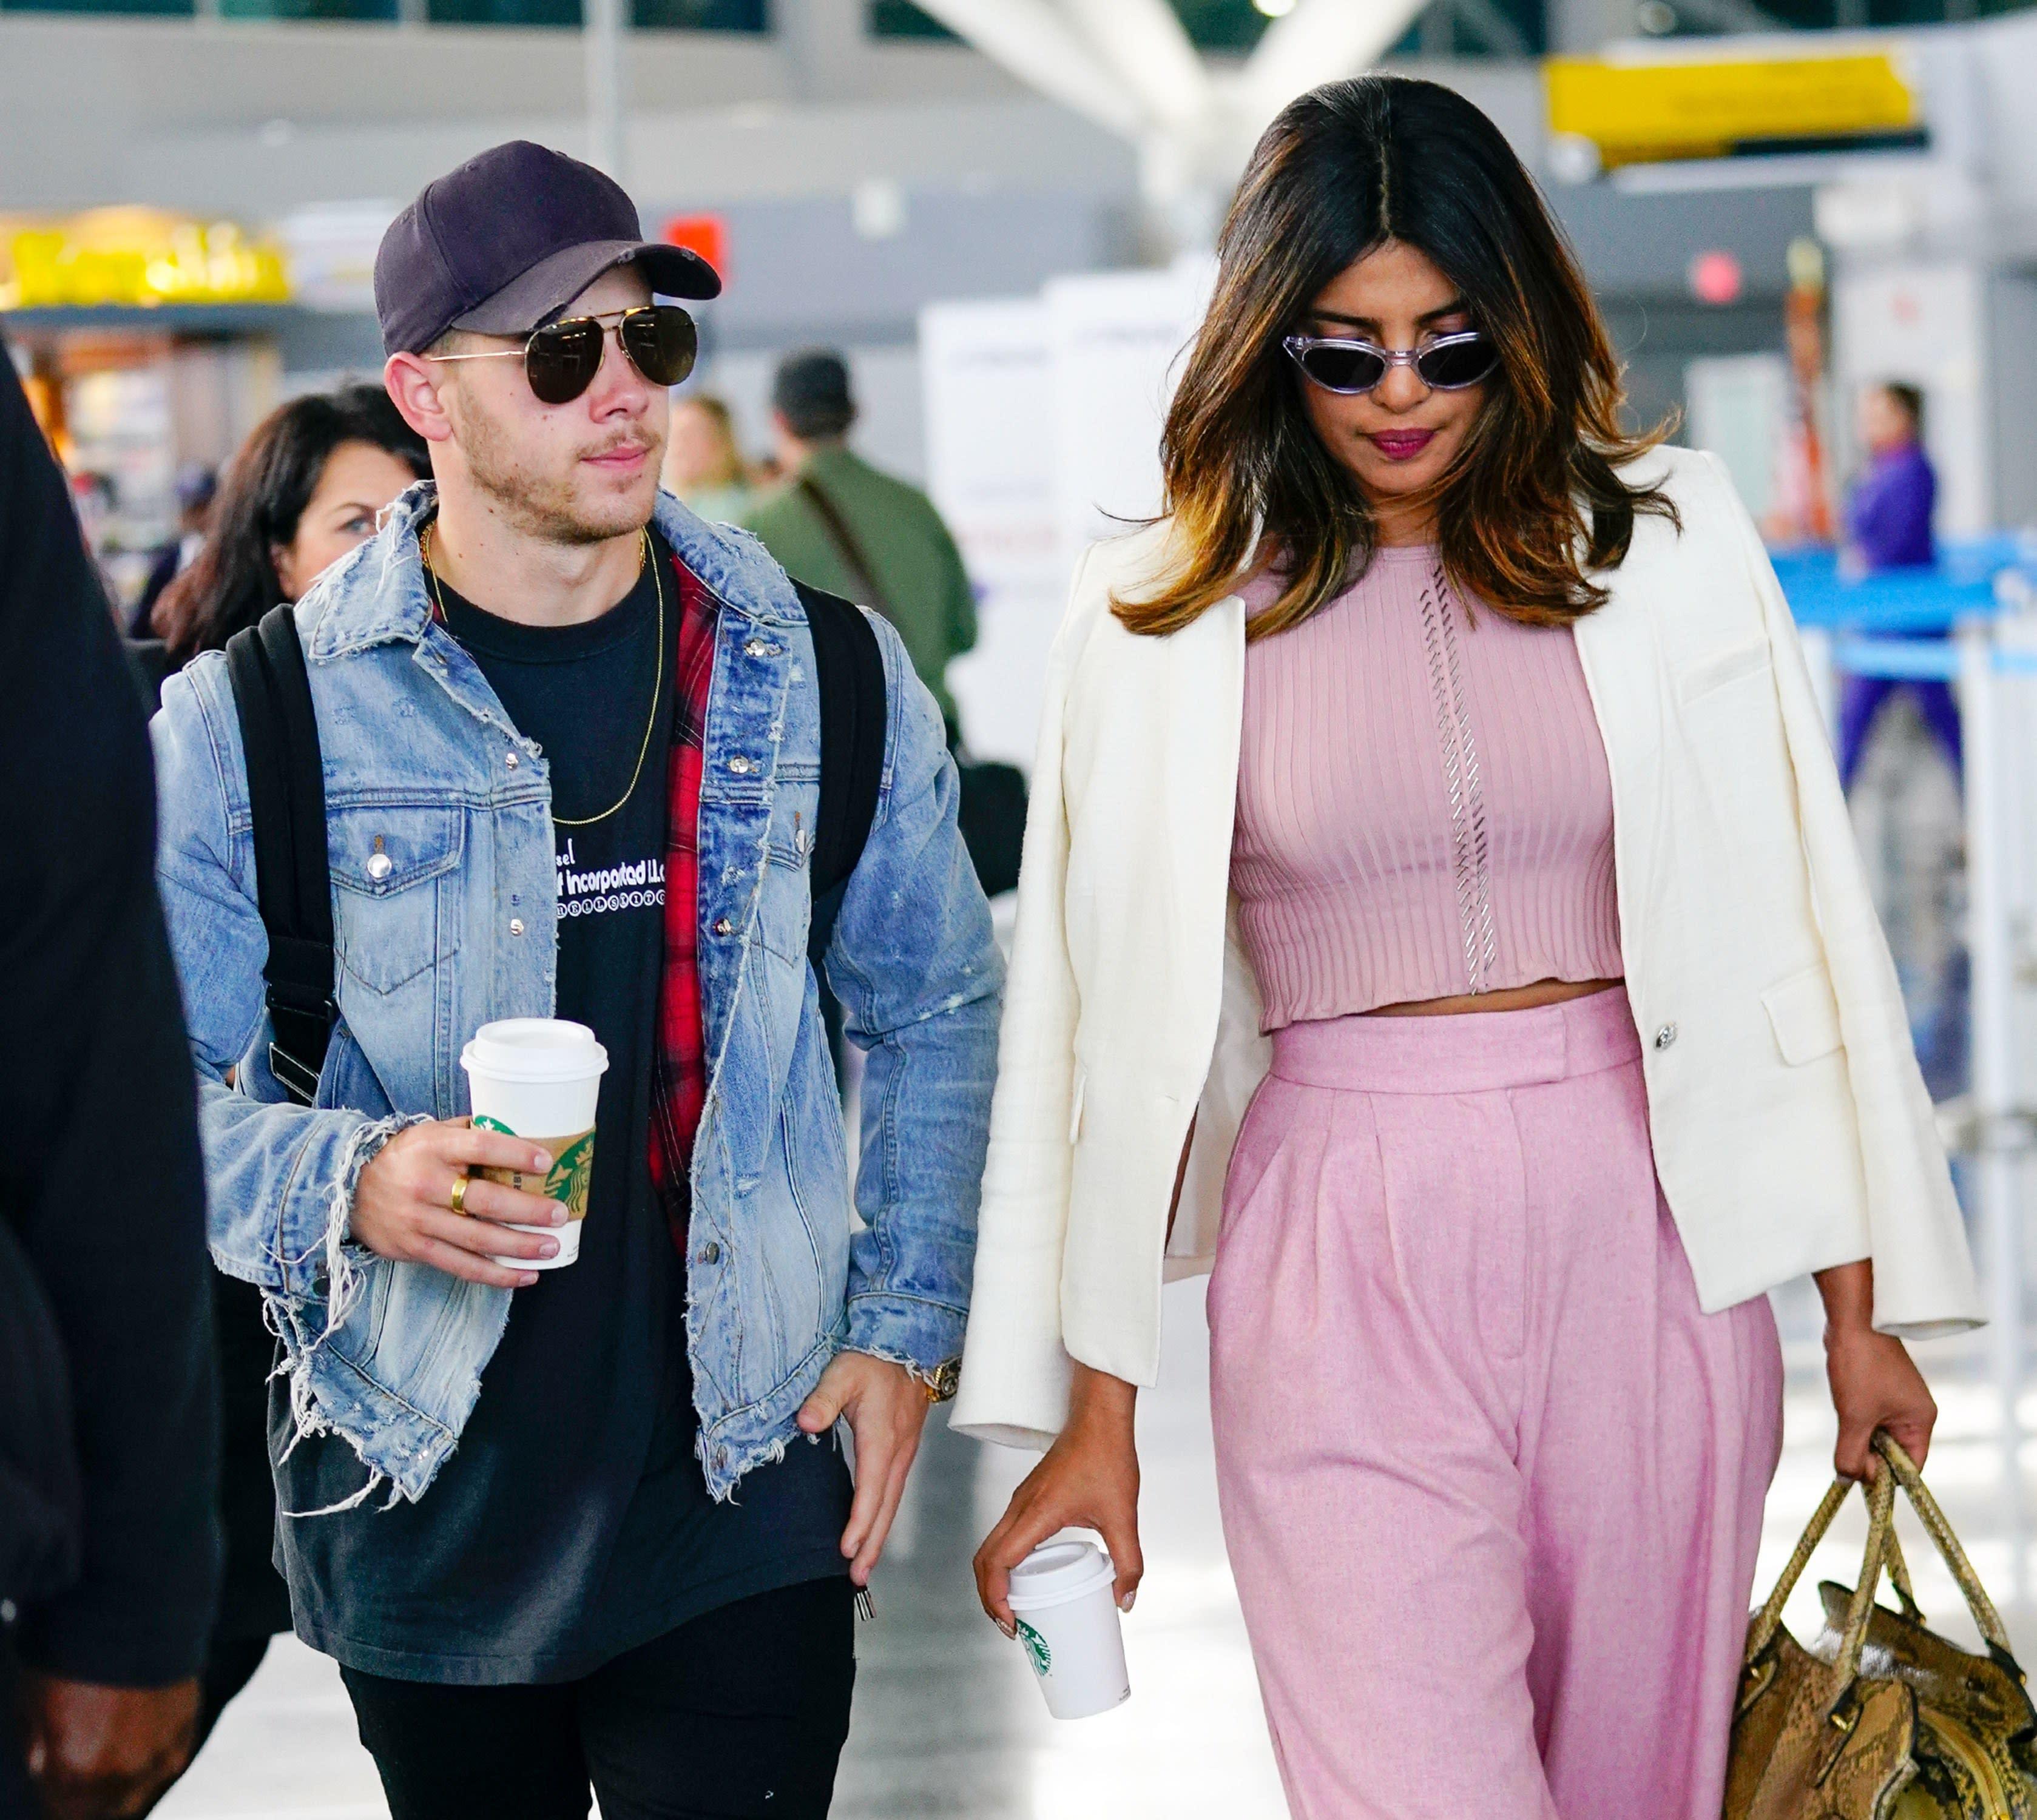 Priyanka Chopra And Nick Jonas Have Arrived In Paris For